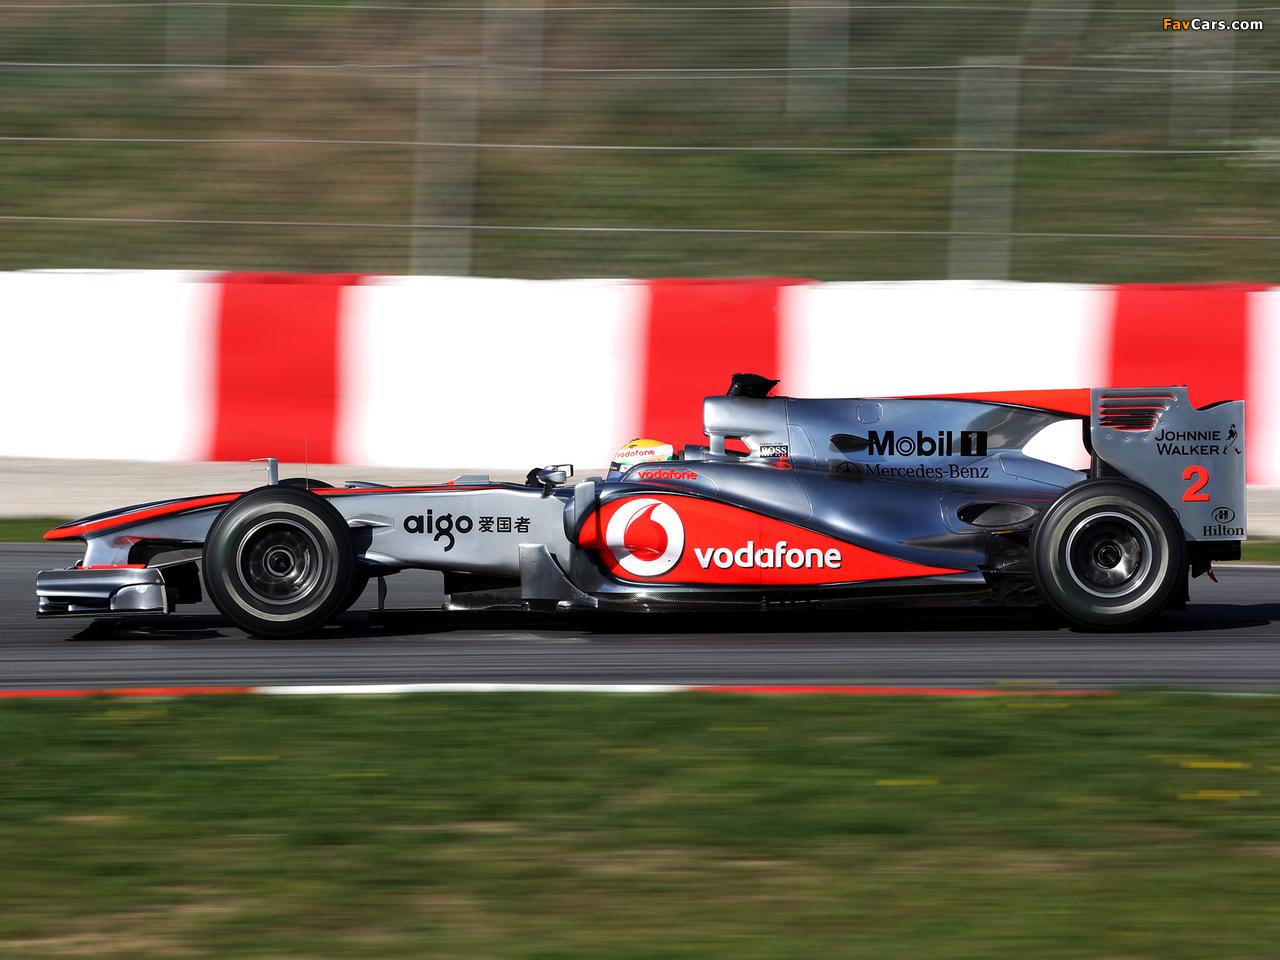 Mclaren mercedes benz mp4 25 2010 wallpapers 1280x960 for Mercedes benz formula 1